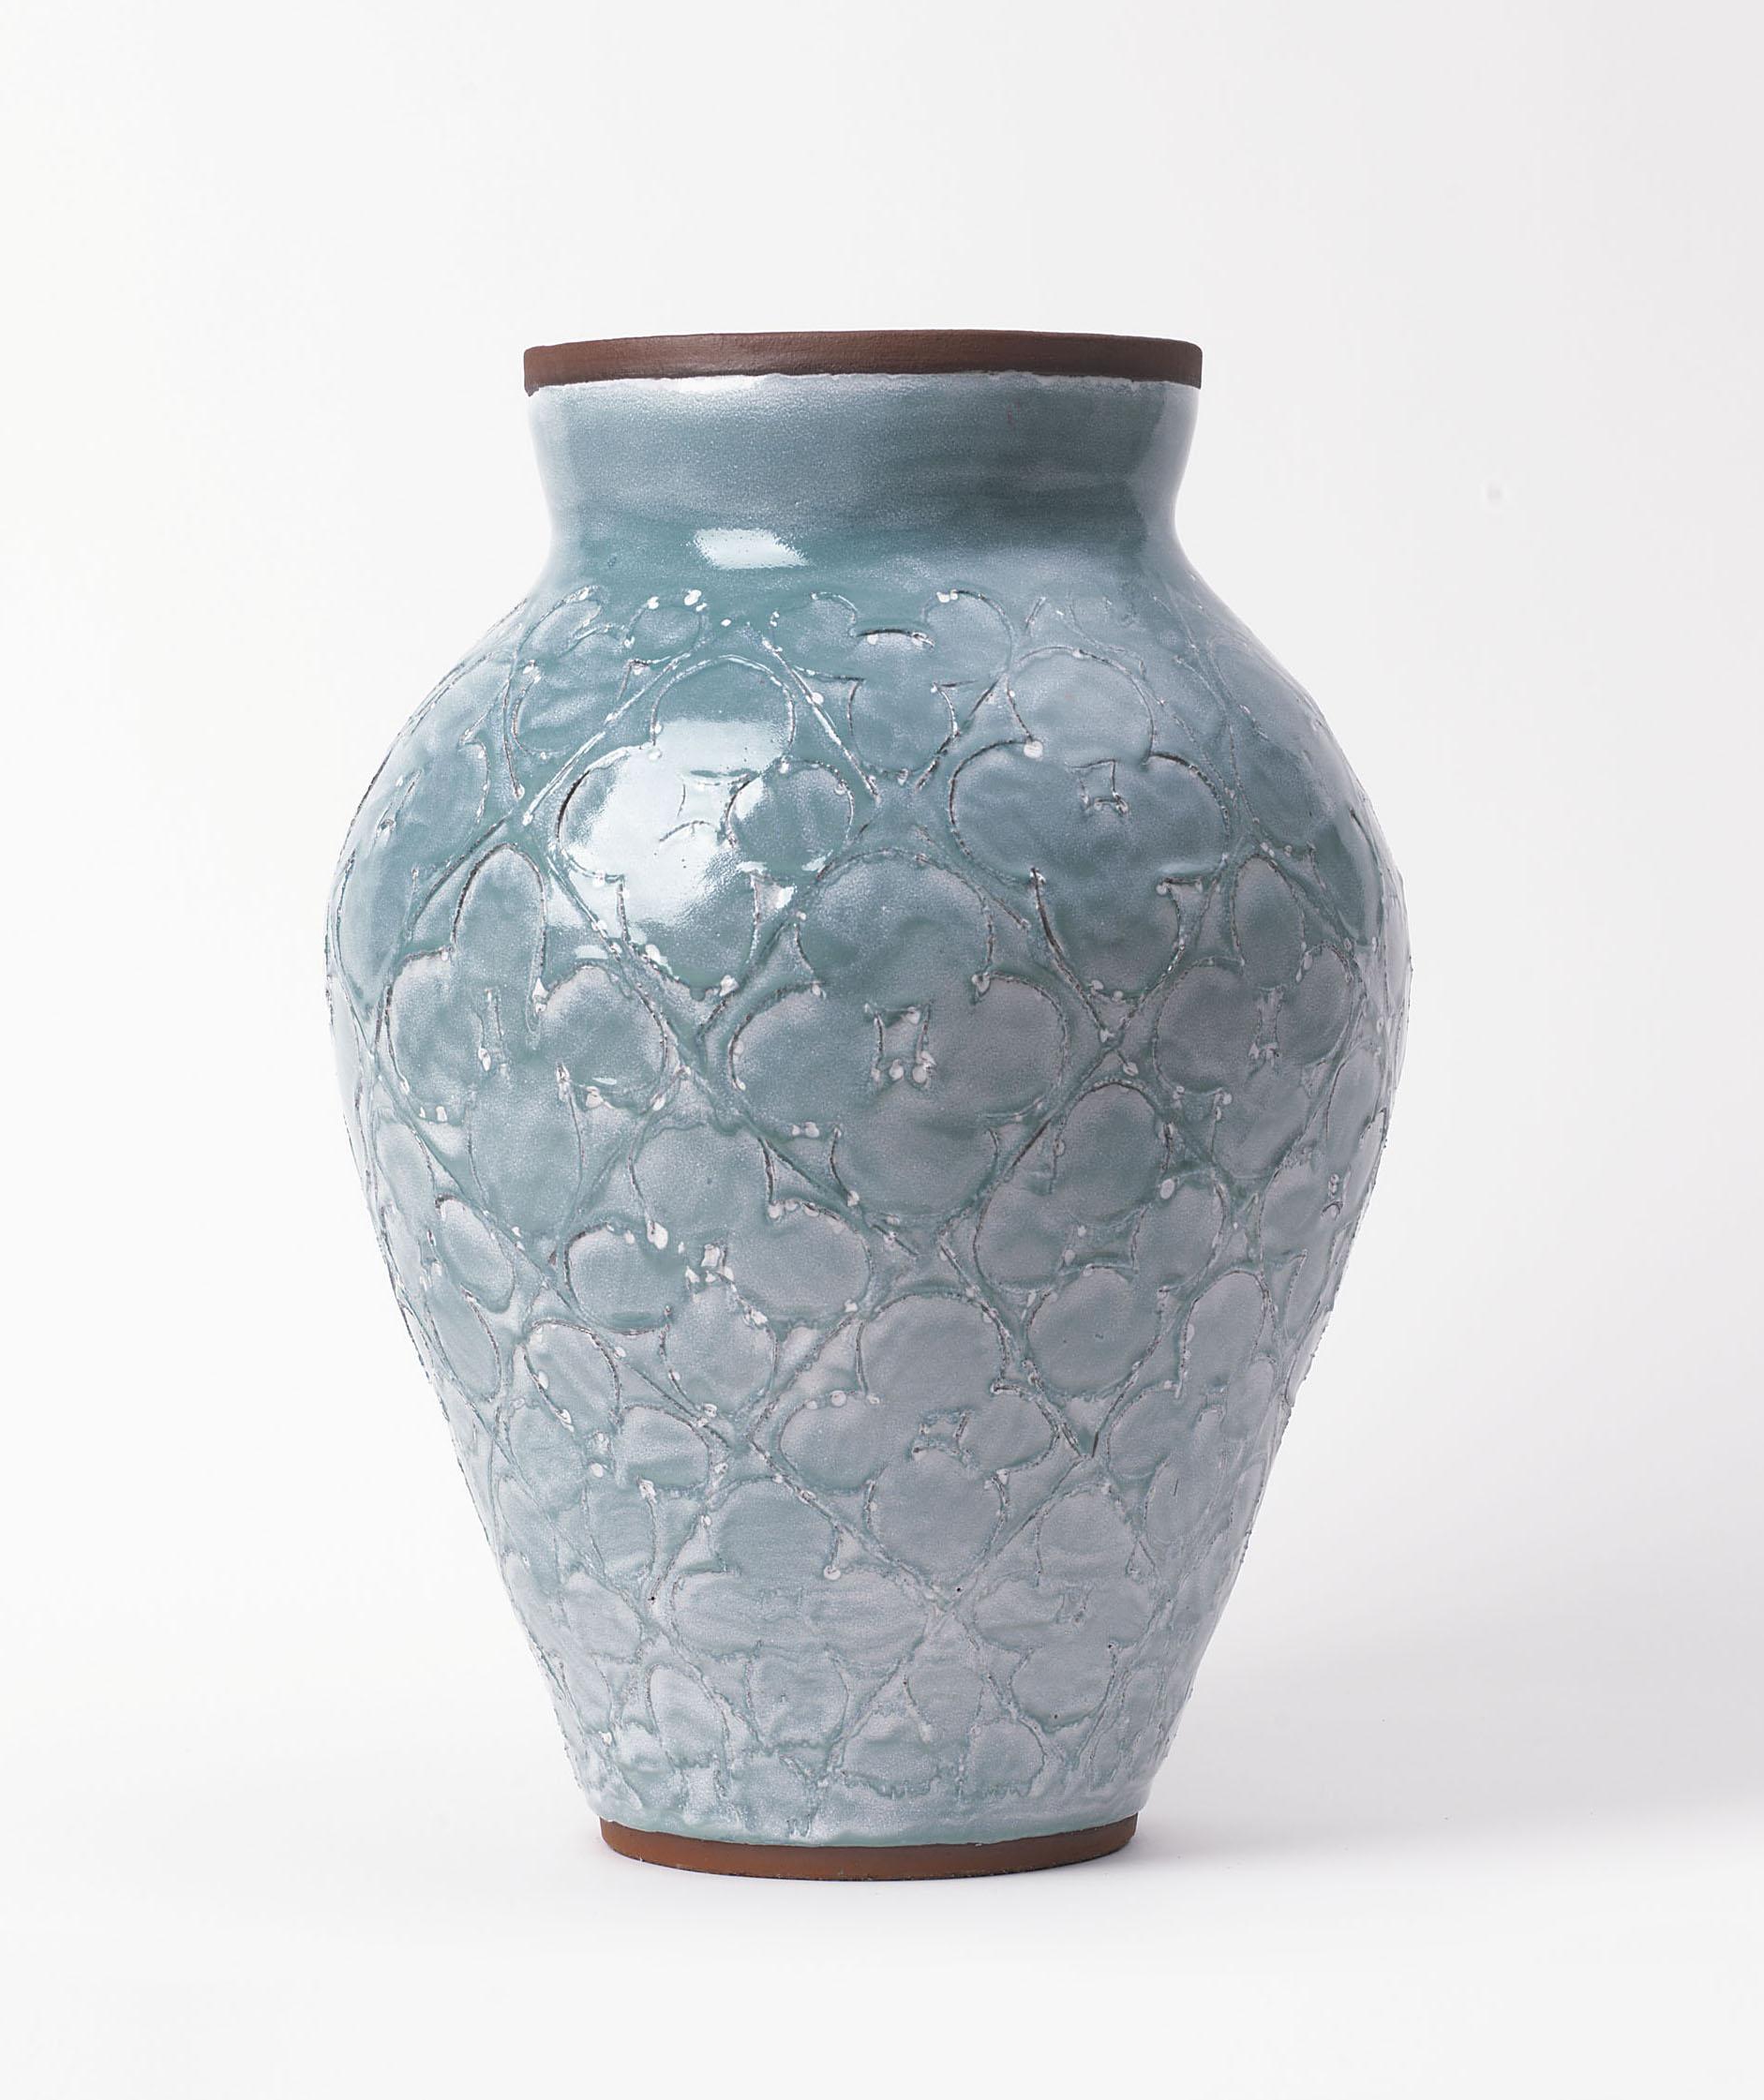 Judy Ledgerwood, Untitled, 2018, Ceramic. Photo credit Günter König.